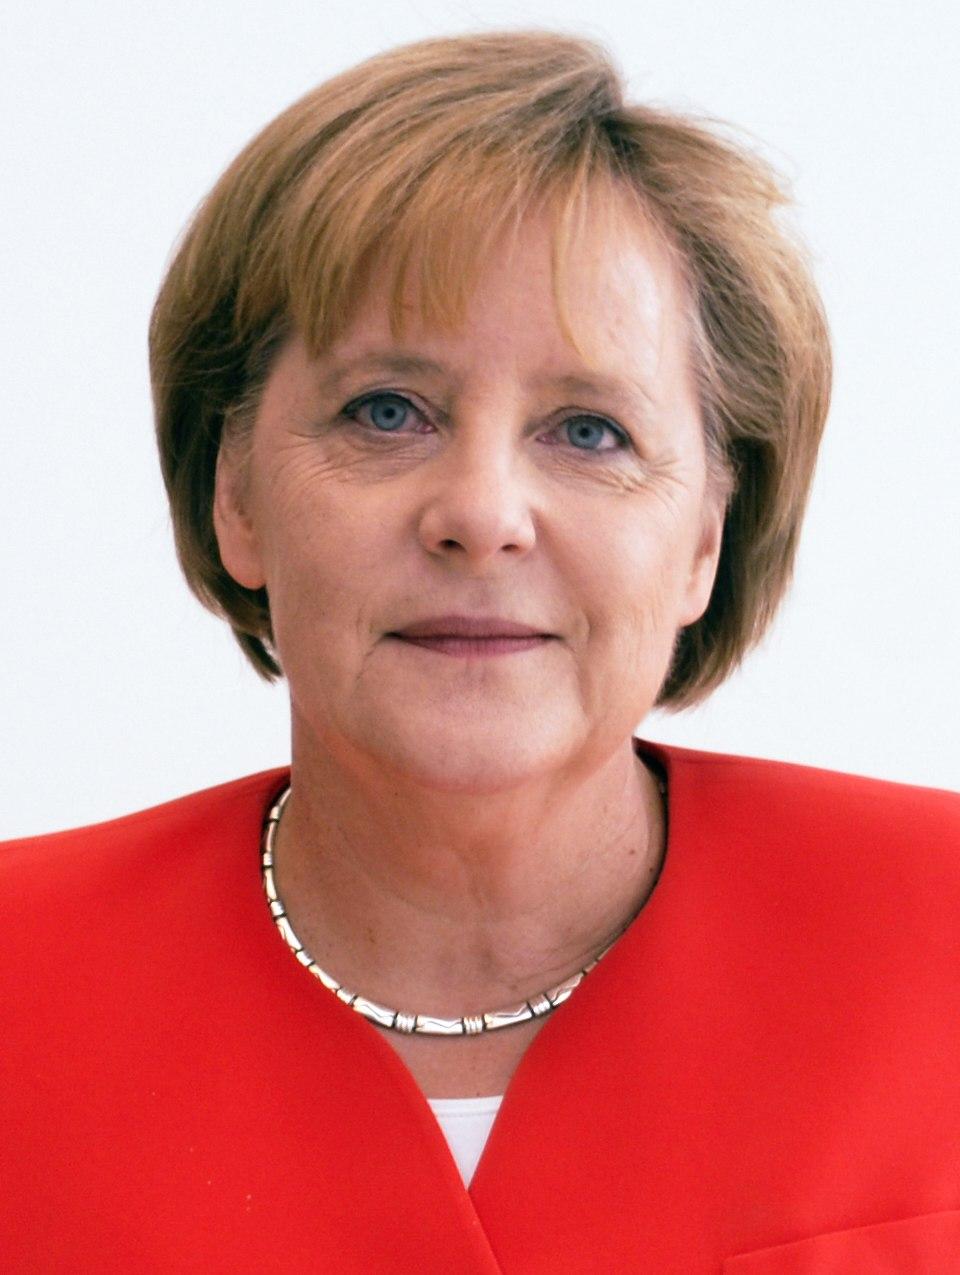 Angela Merkel Juli 2010 - 3zu4 (cropped 2)